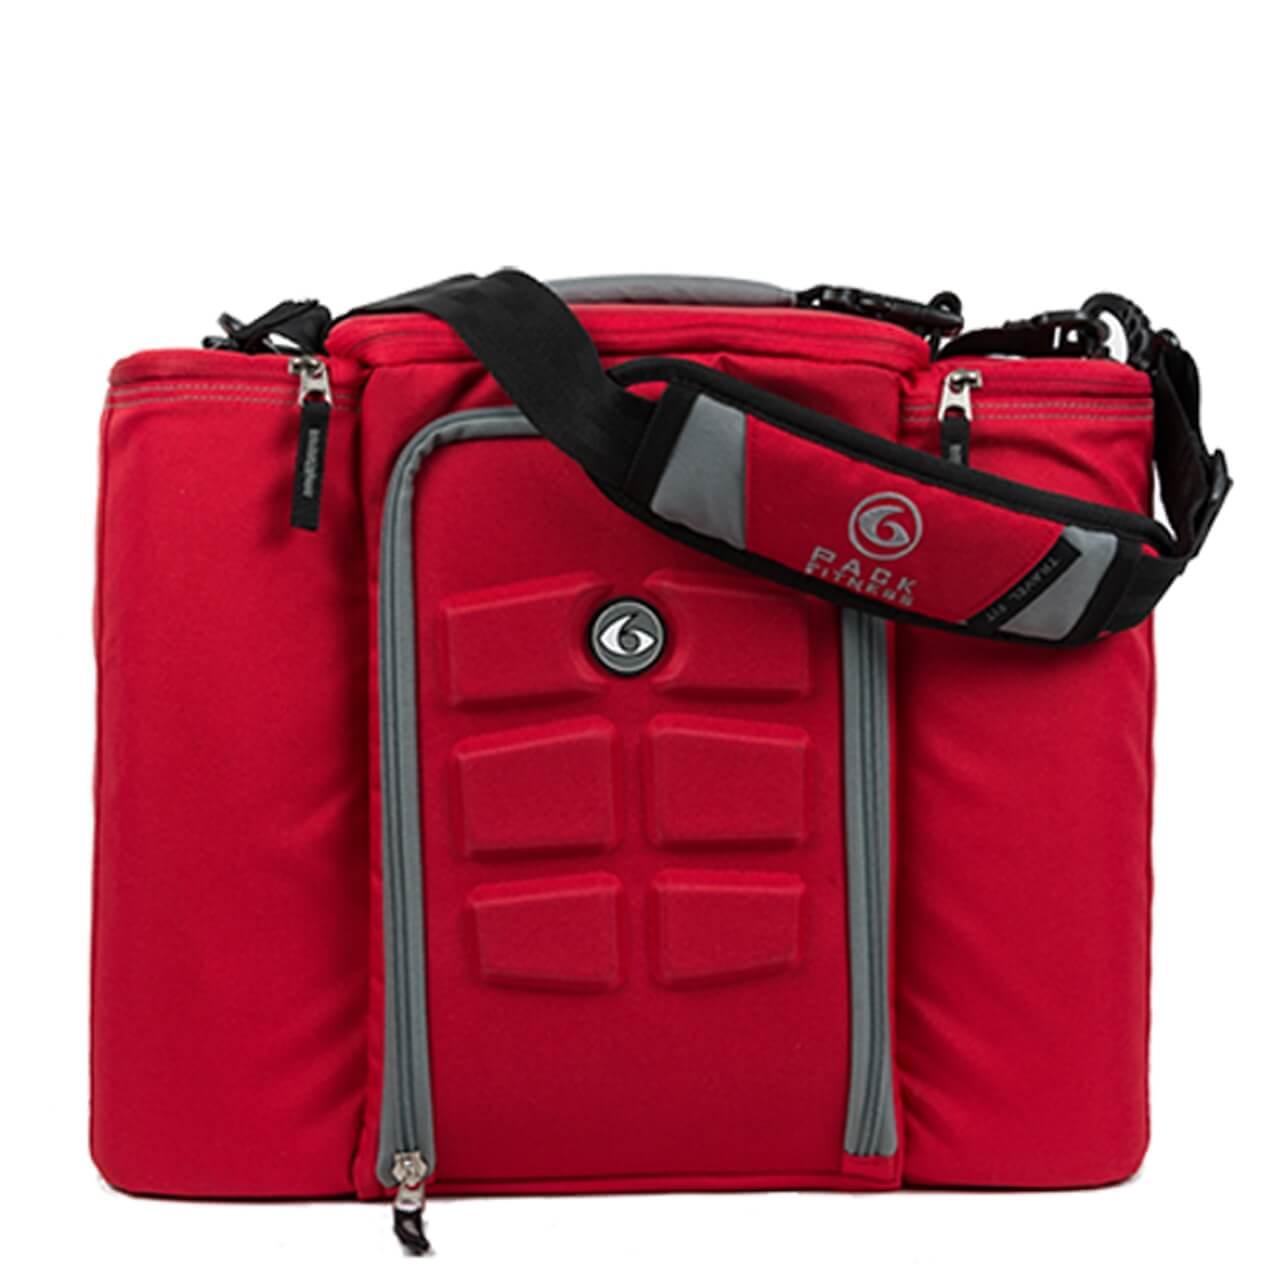 Taška na jedlo Expert Innovator 500 Red/Grey - 6 Pack Fitness